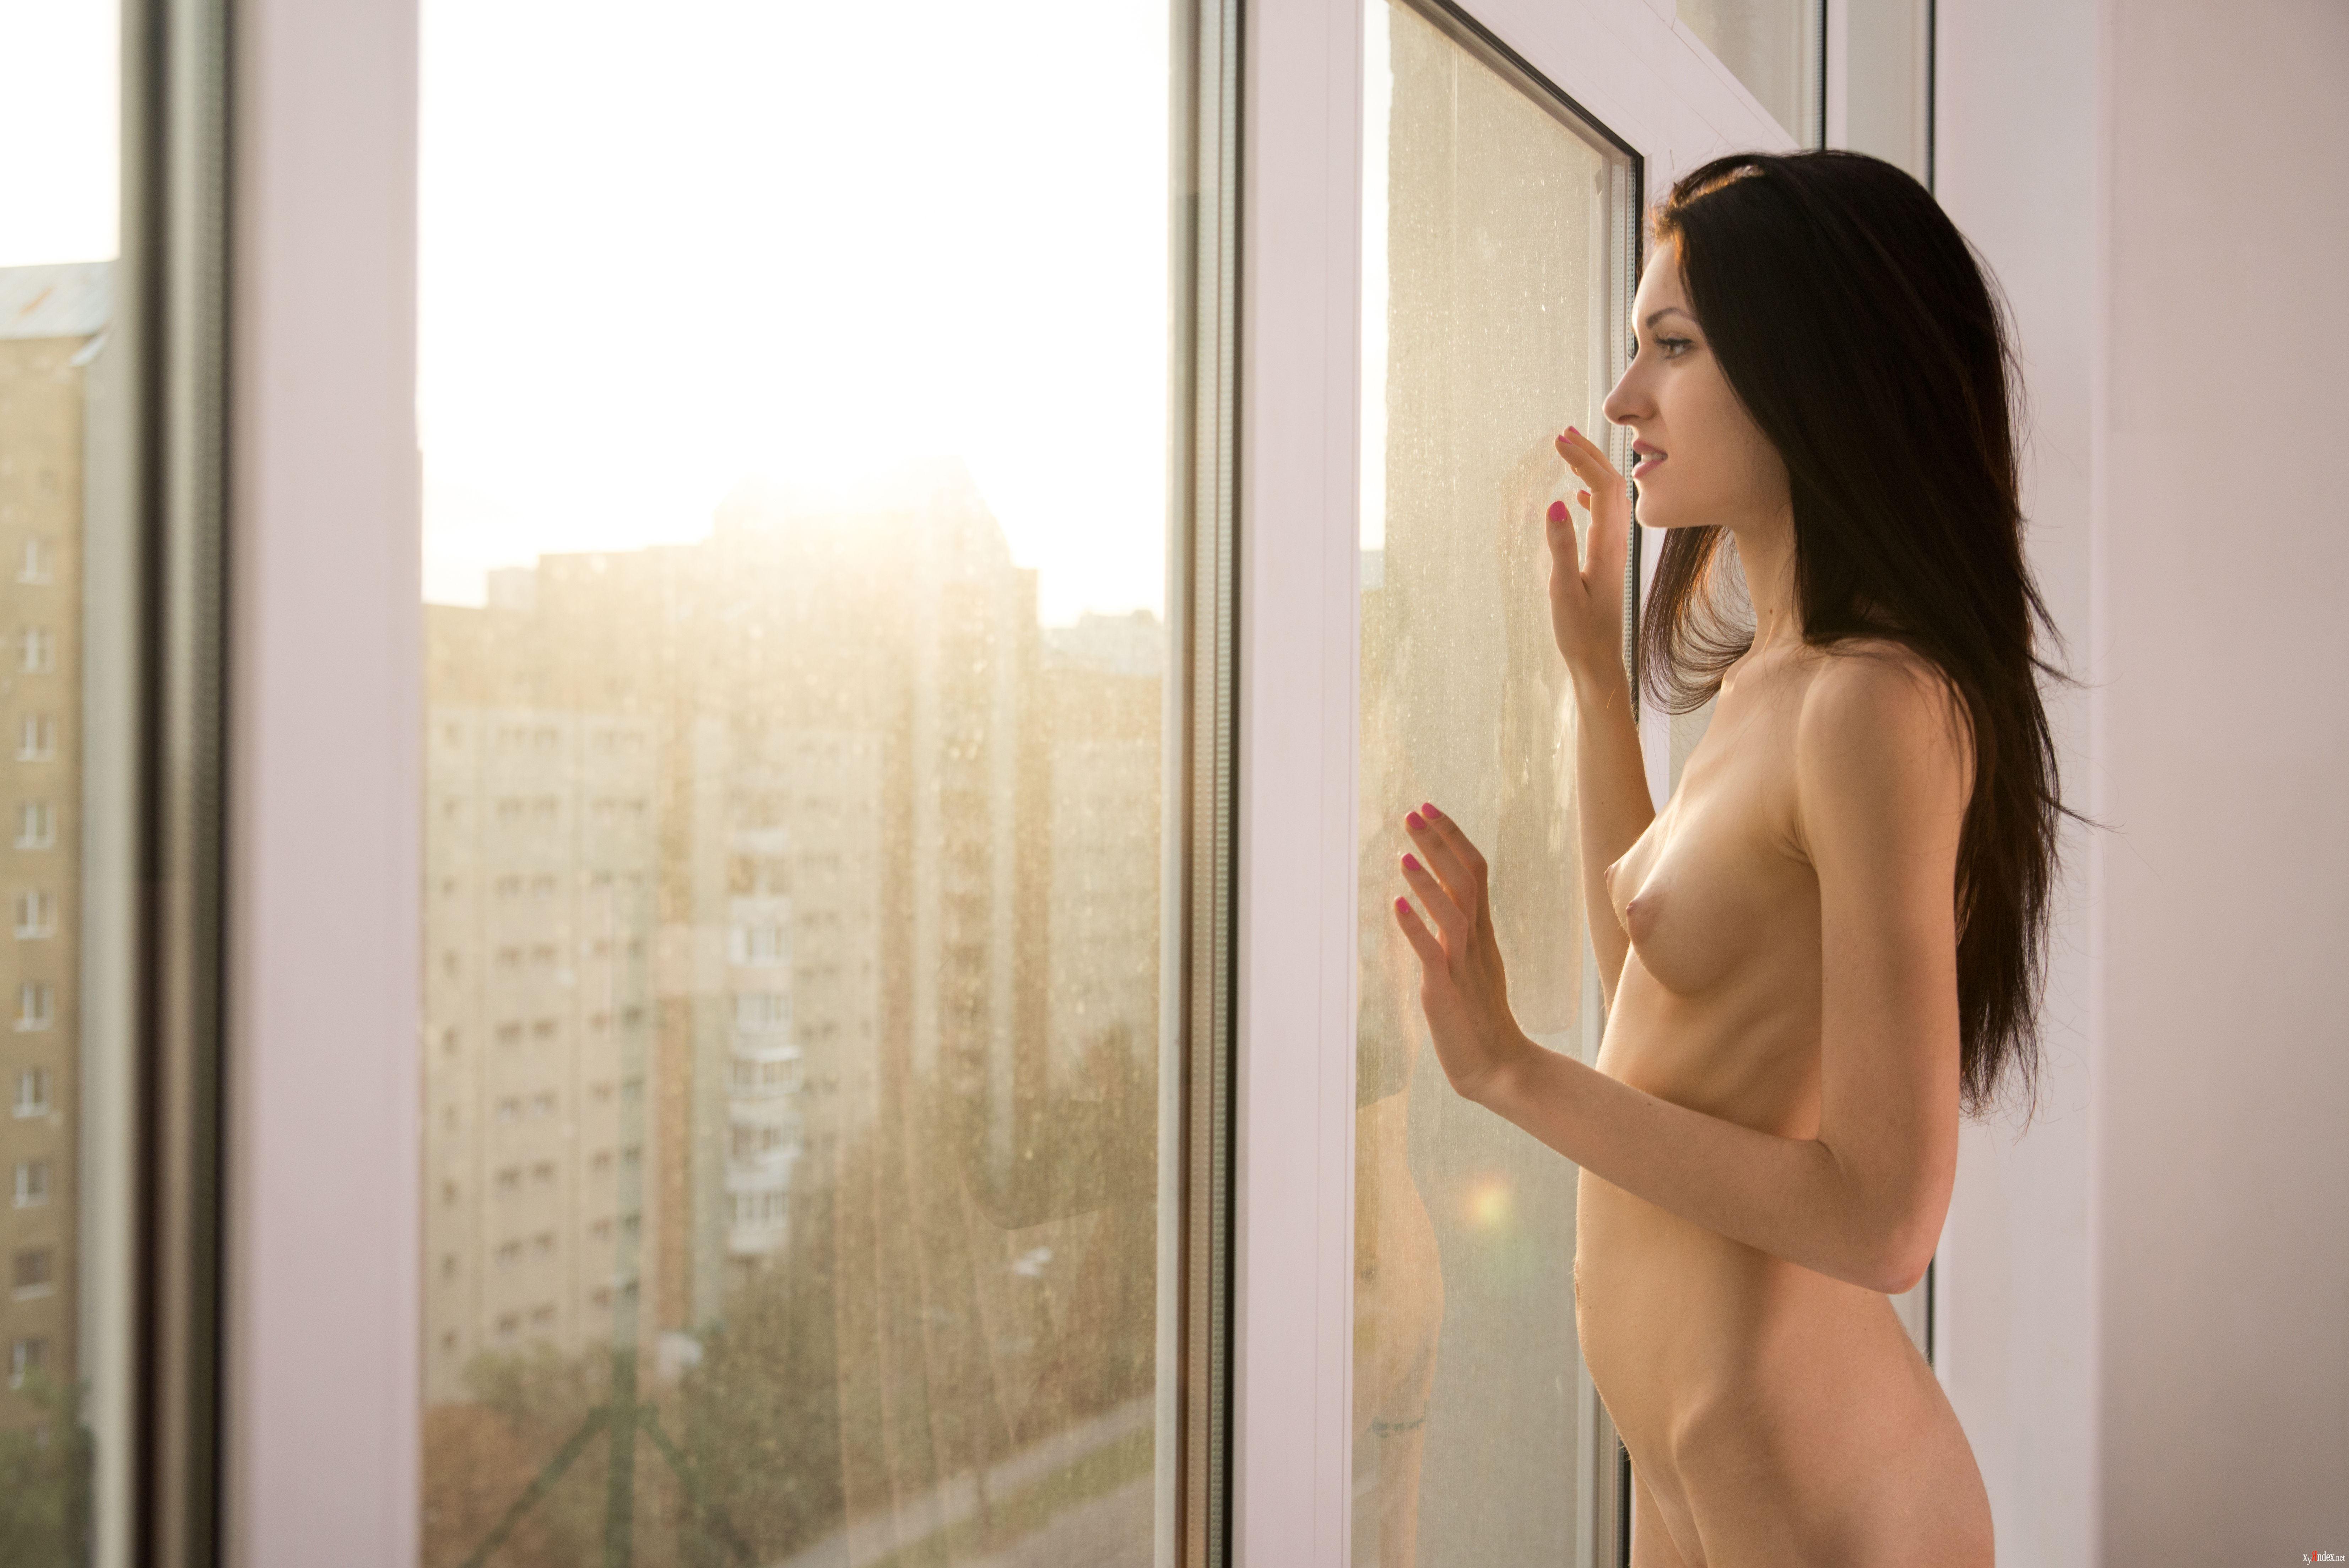 window-naked-gf-sis-naked